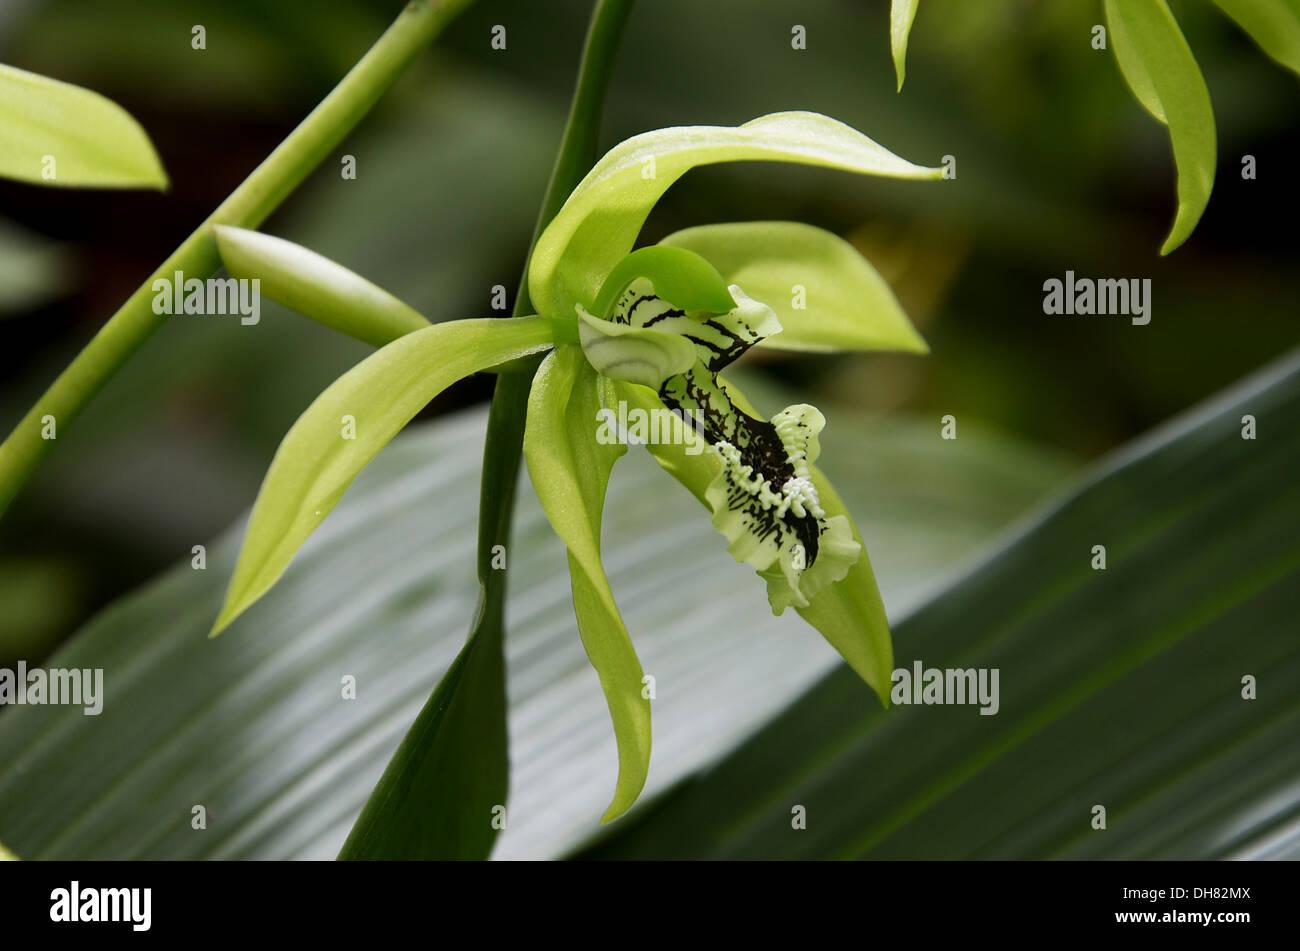 schwarze orchidee aus borneo stockfoto bild 62258026 alamy. Black Bedroom Furniture Sets. Home Design Ideas